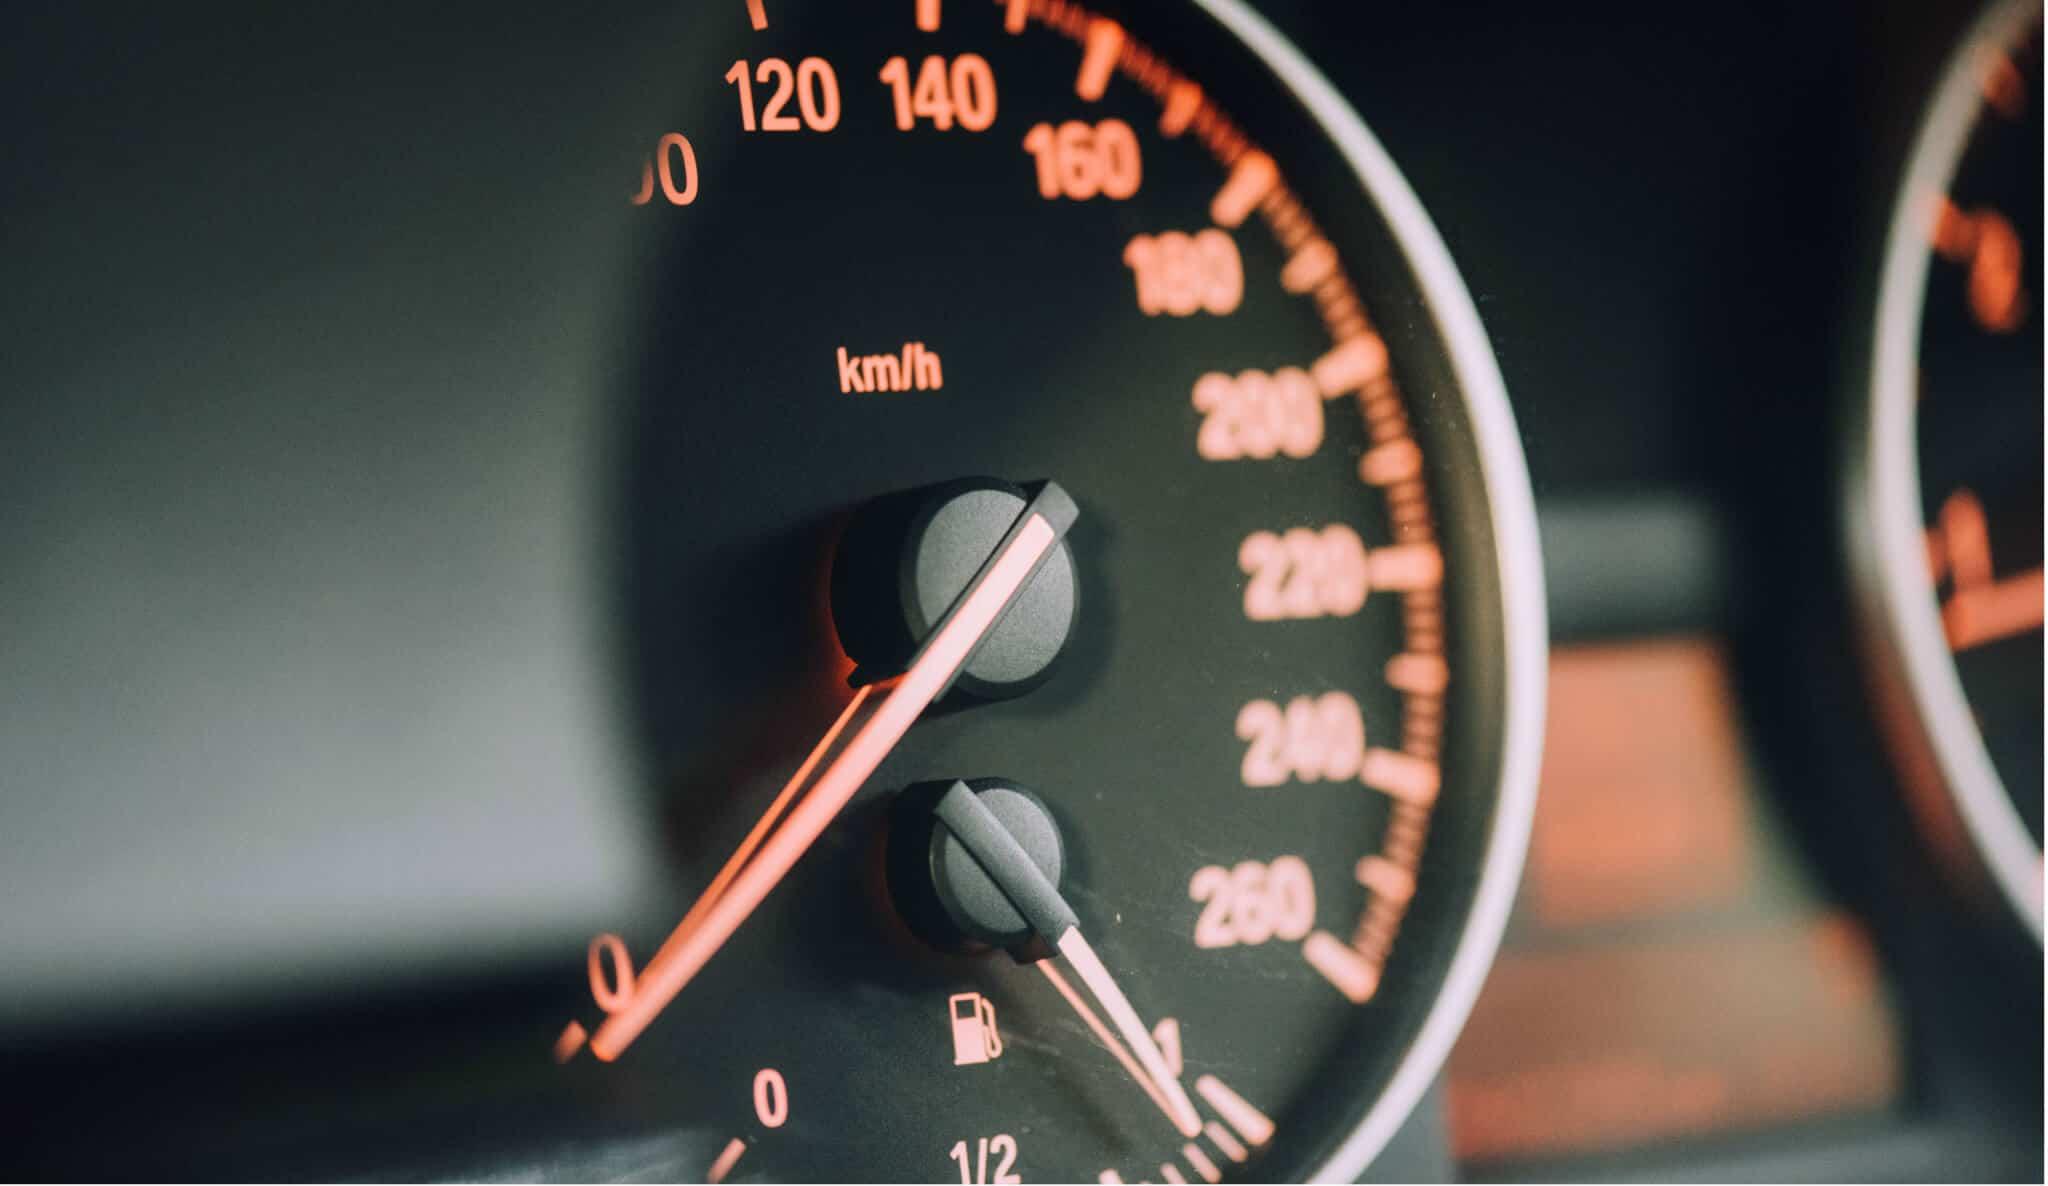 contador de quilómetros do carro